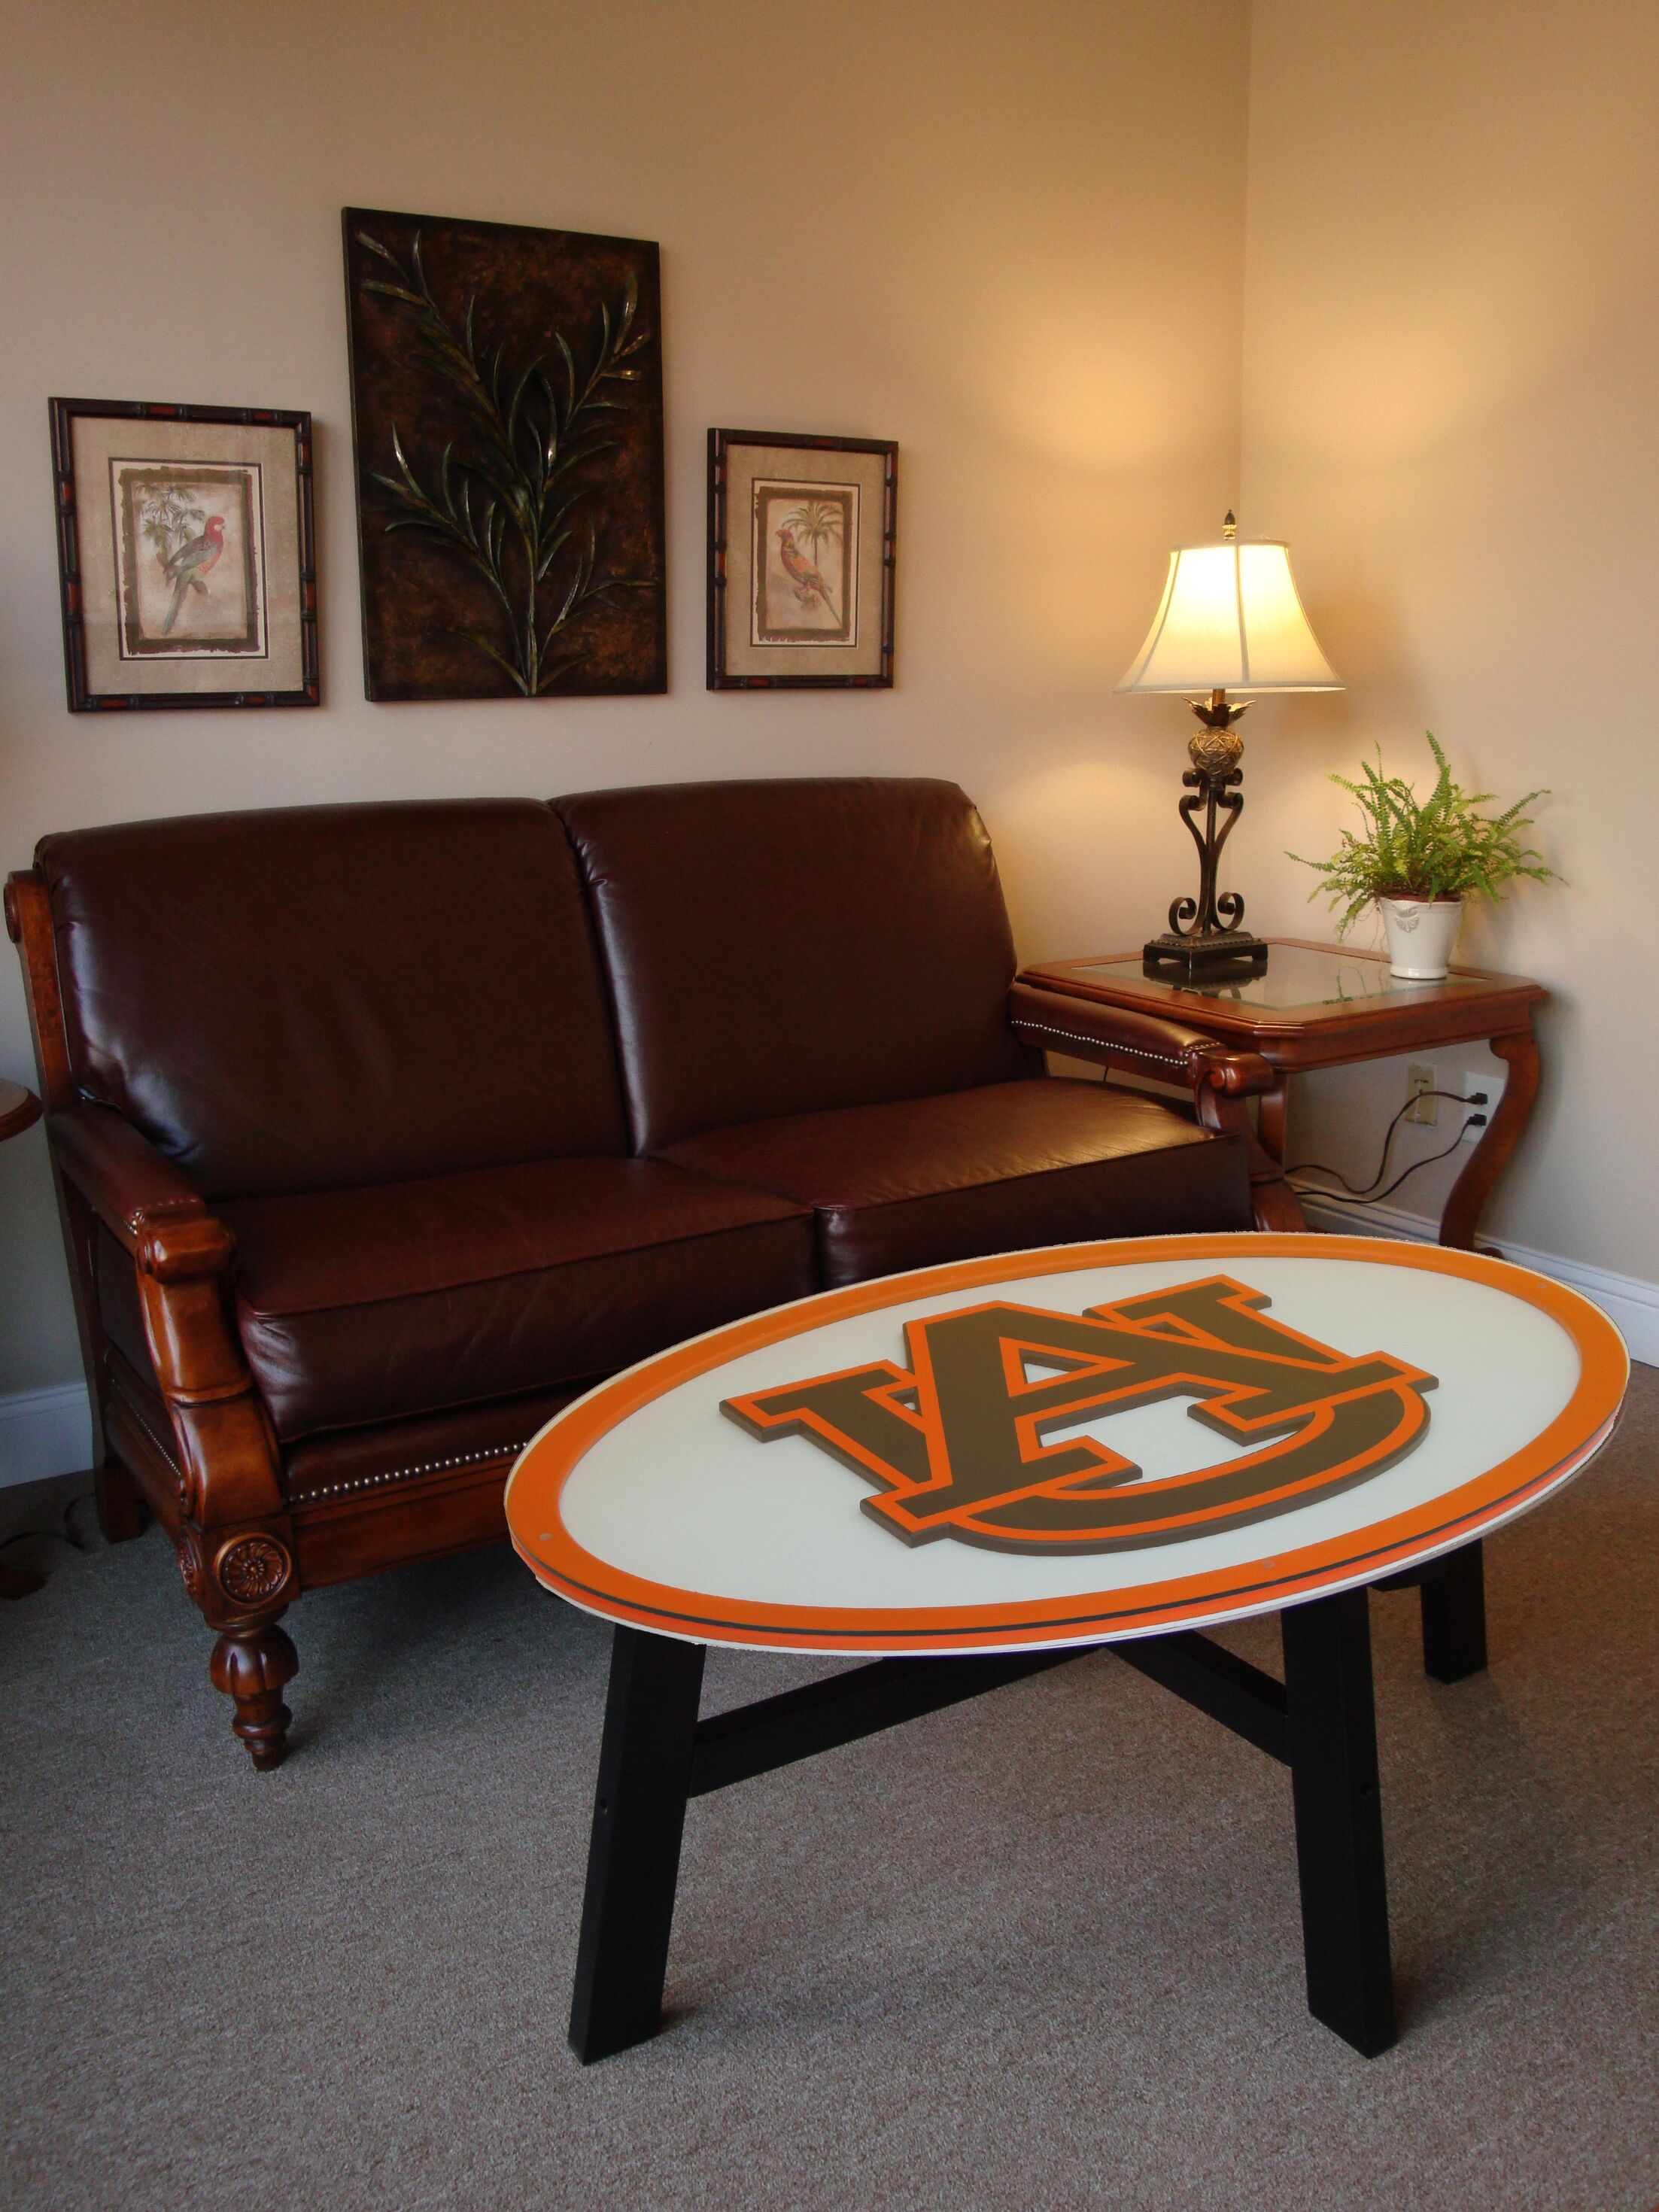 Ncaa Coffee Table NCAA Team: Auburn